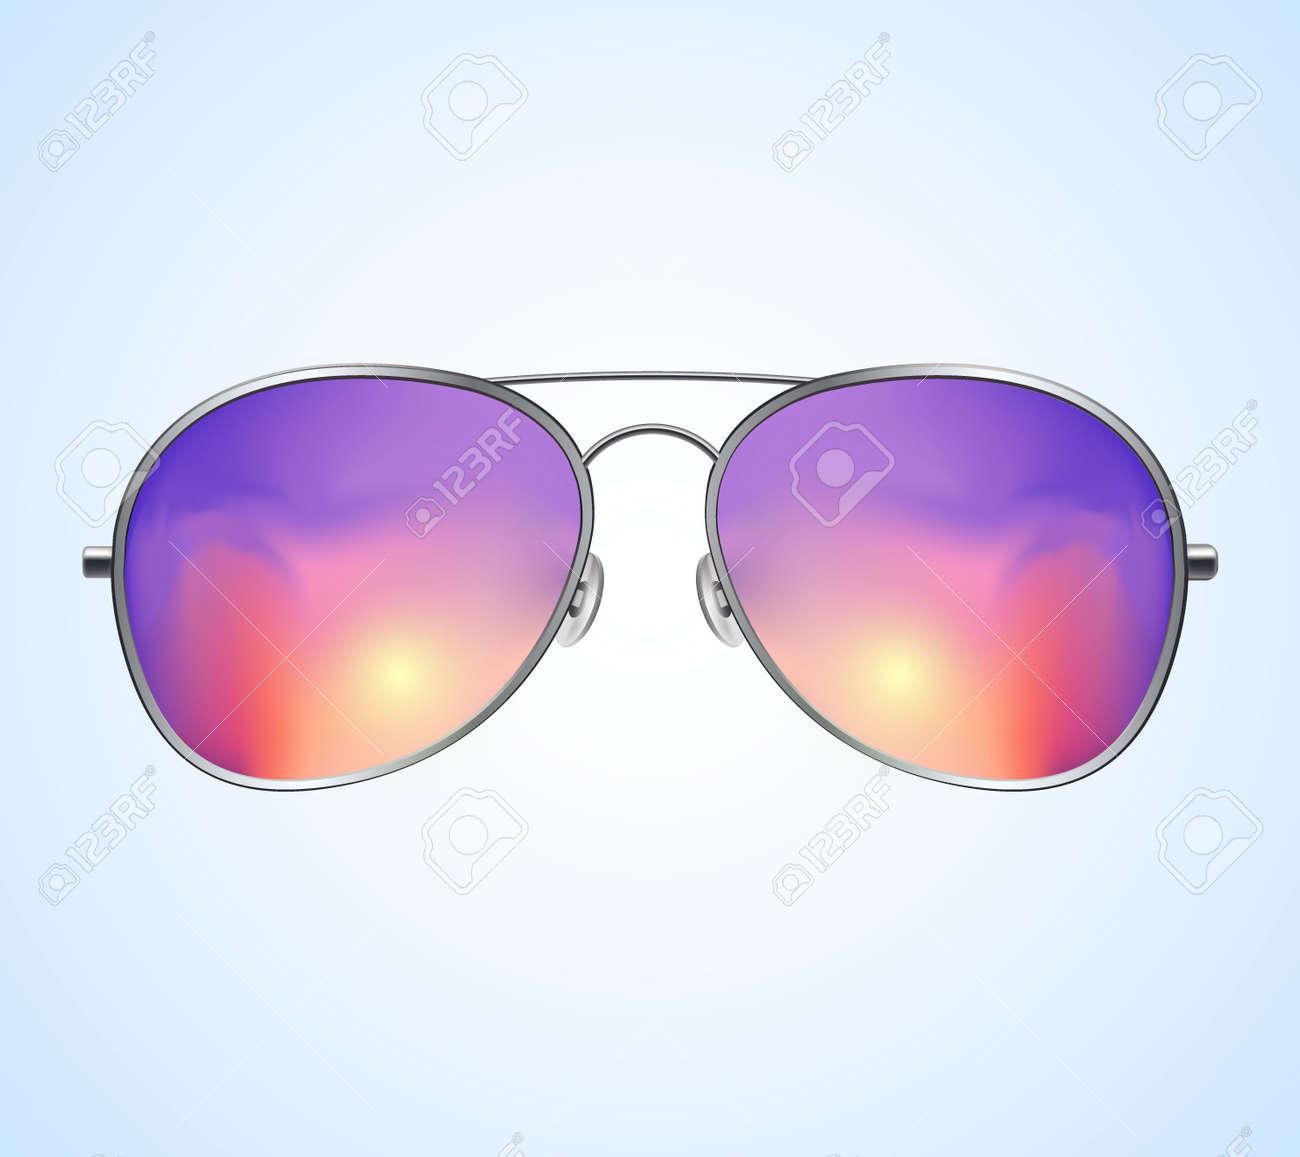 Aviator Sunglasses Illustration Background. Sunset. Police isolated sunglasses. - 172594300